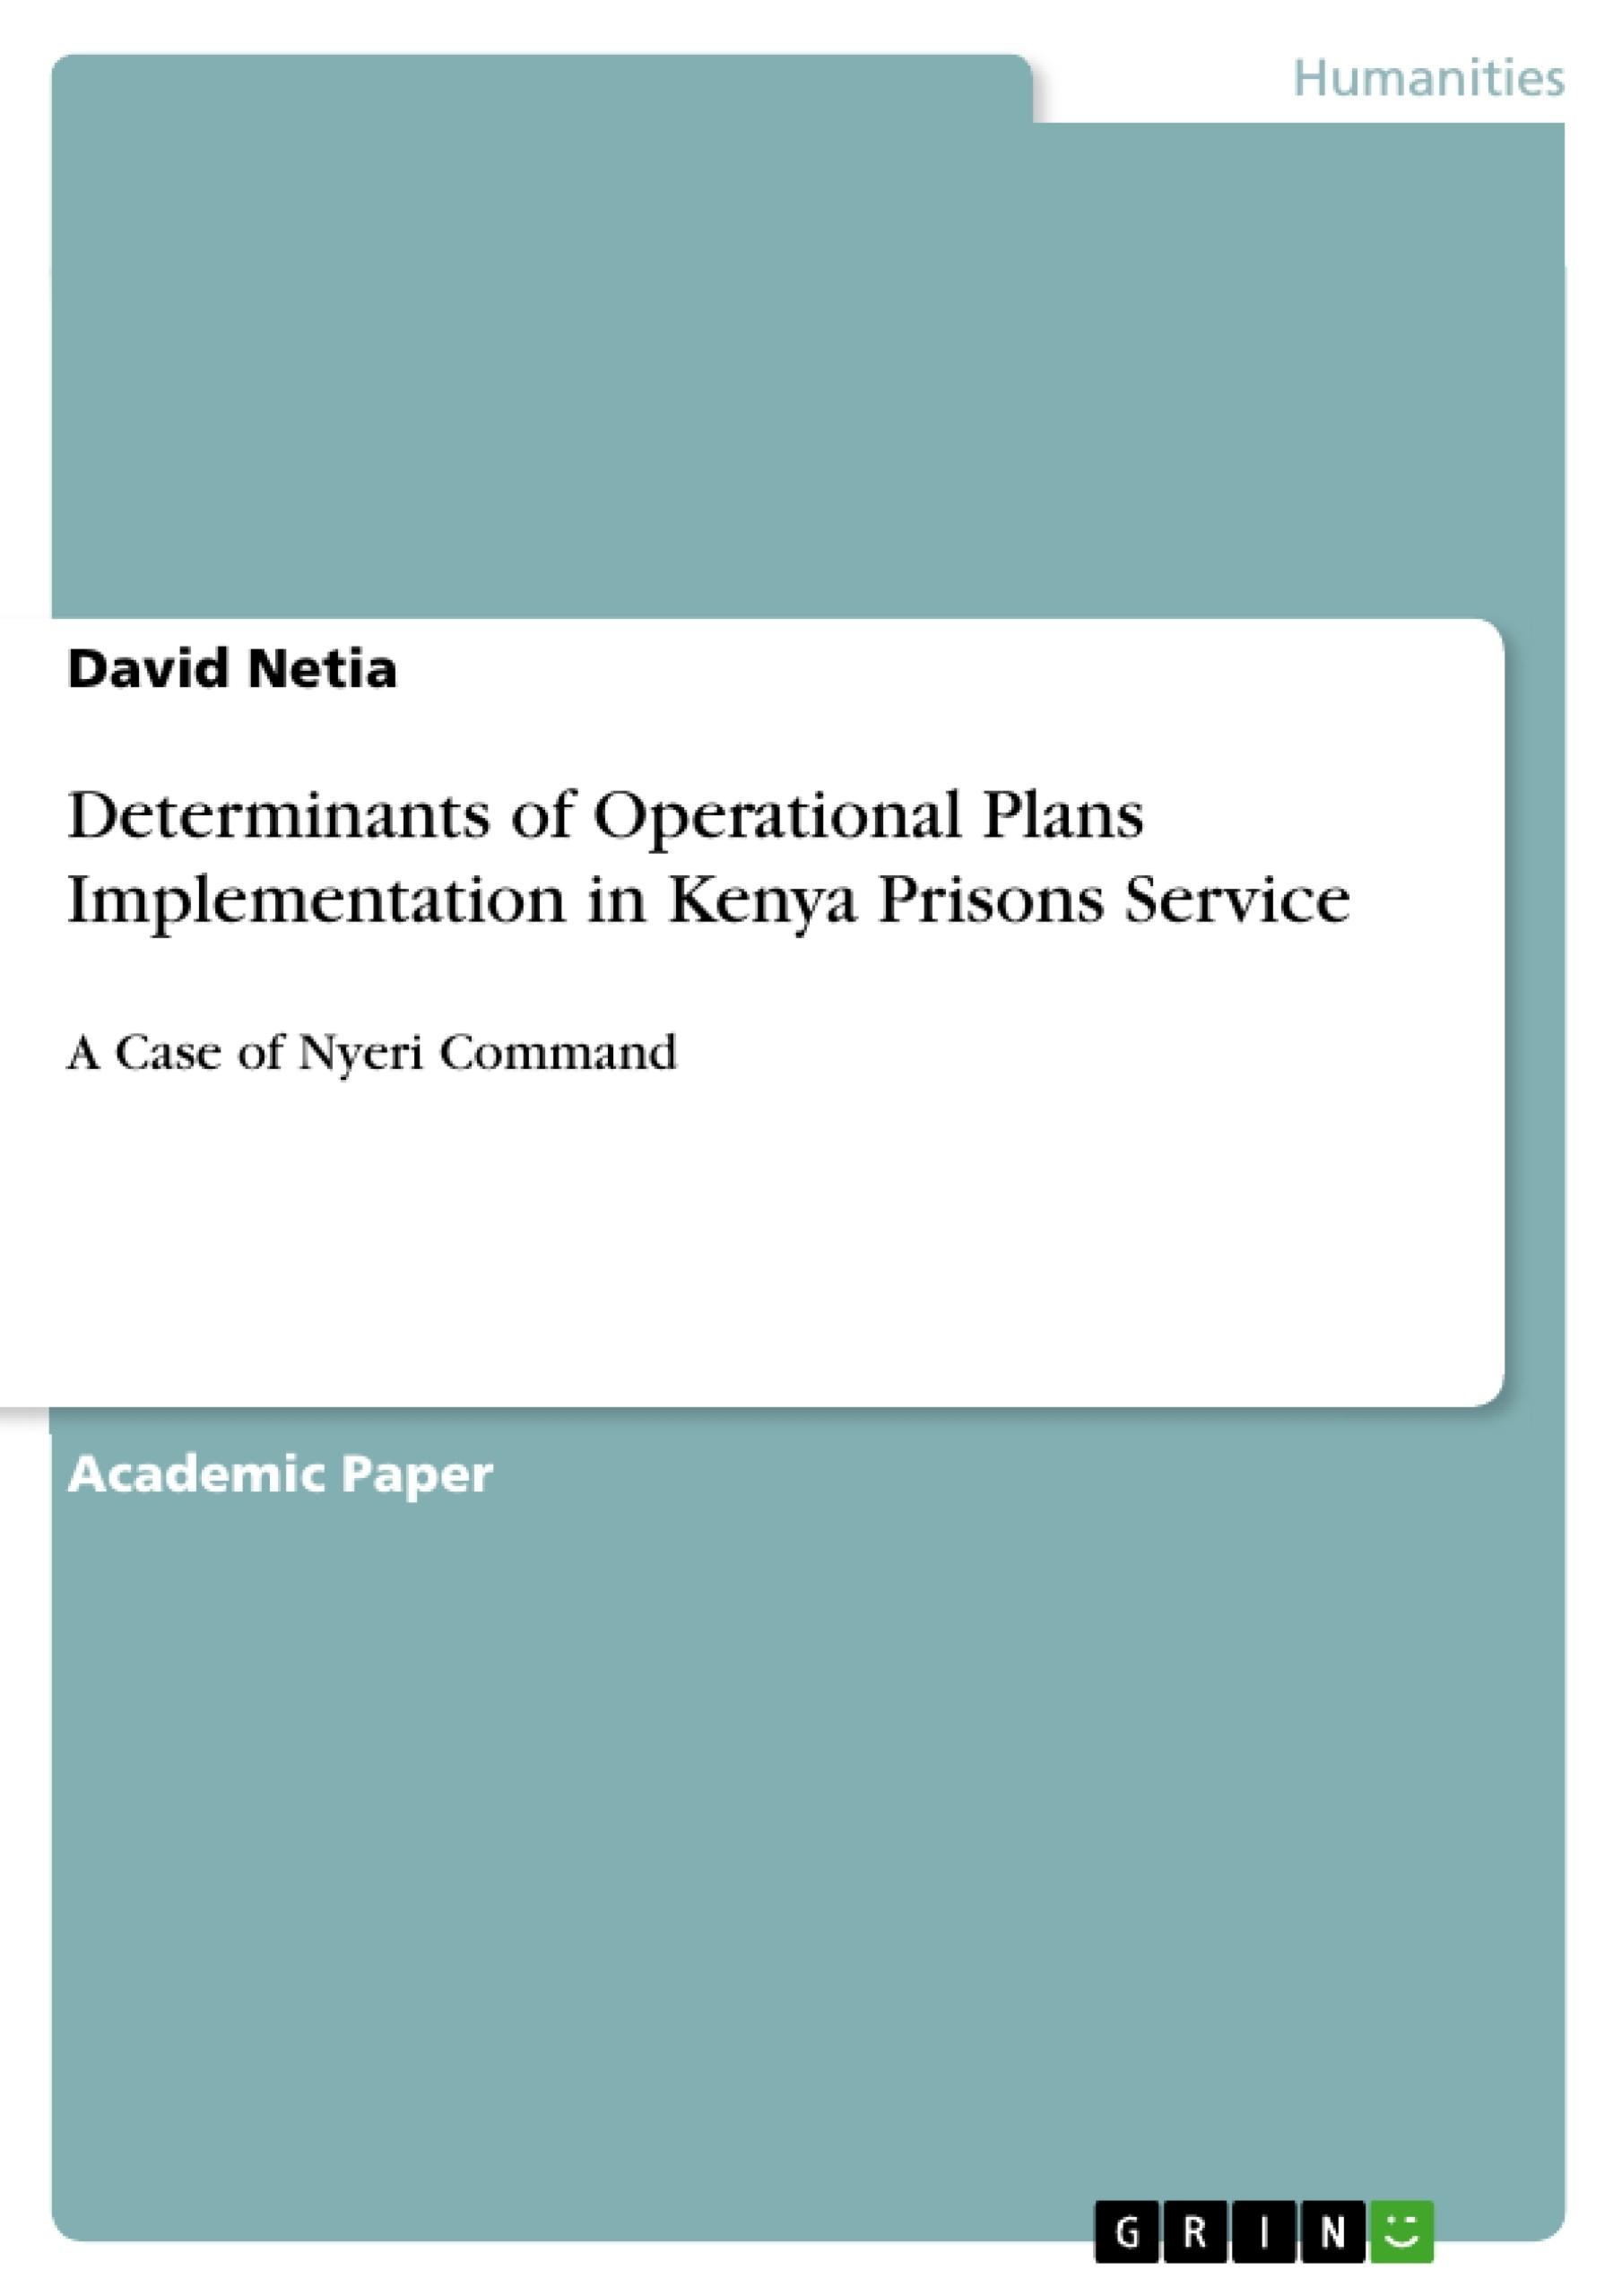 Title: Determinants of Operational Plans Implementation in Kenya Prisons Service